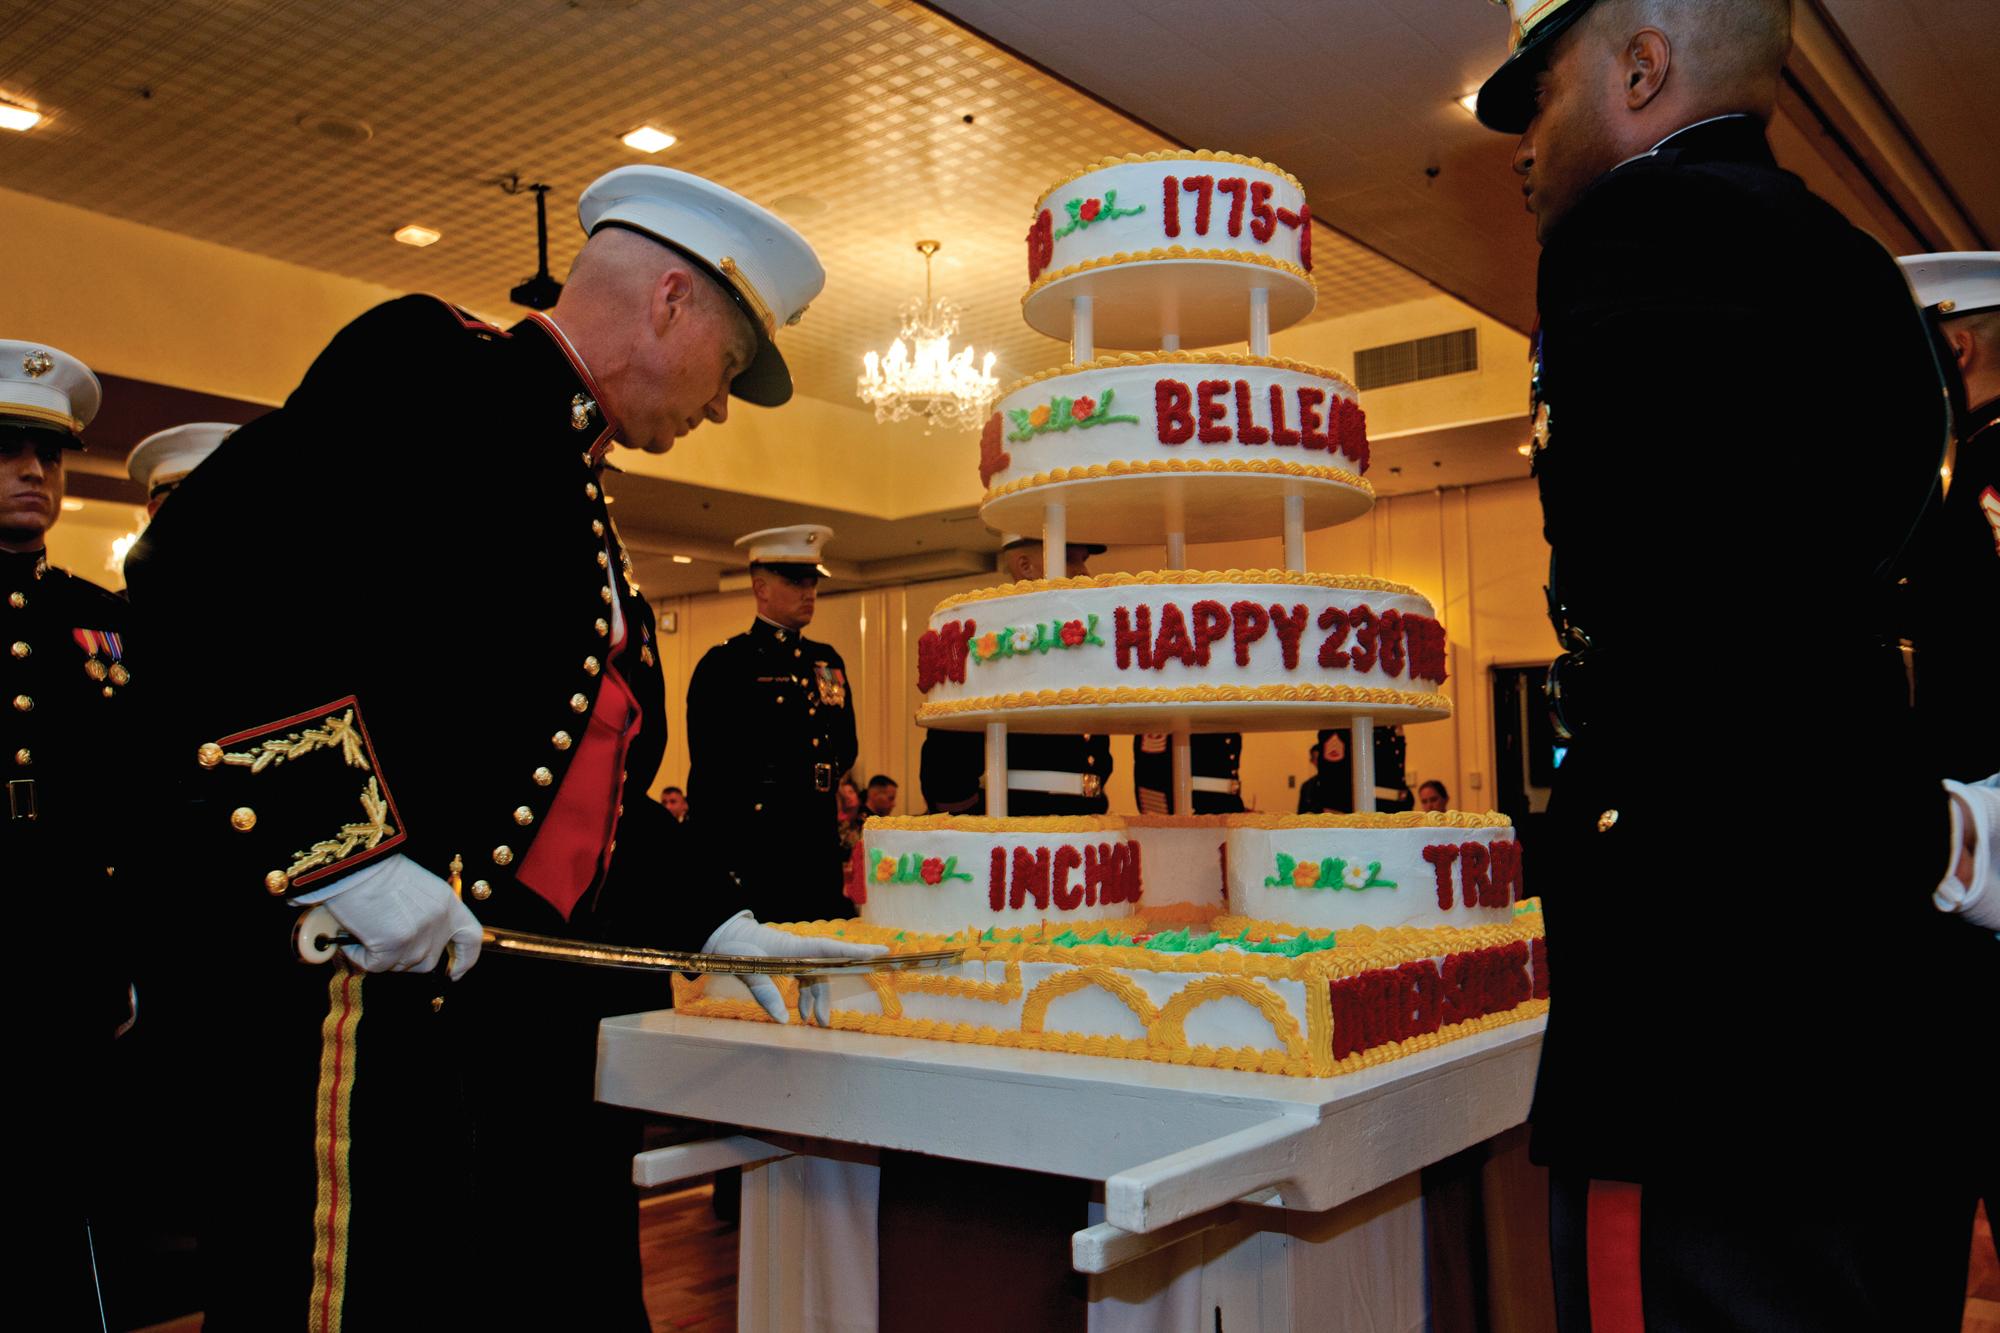 Awesome Iii Mef Mcipac Units Celebrate 238Th Marine Corps Birthday Funny Birthday Cards Online Elaedamsfinfo